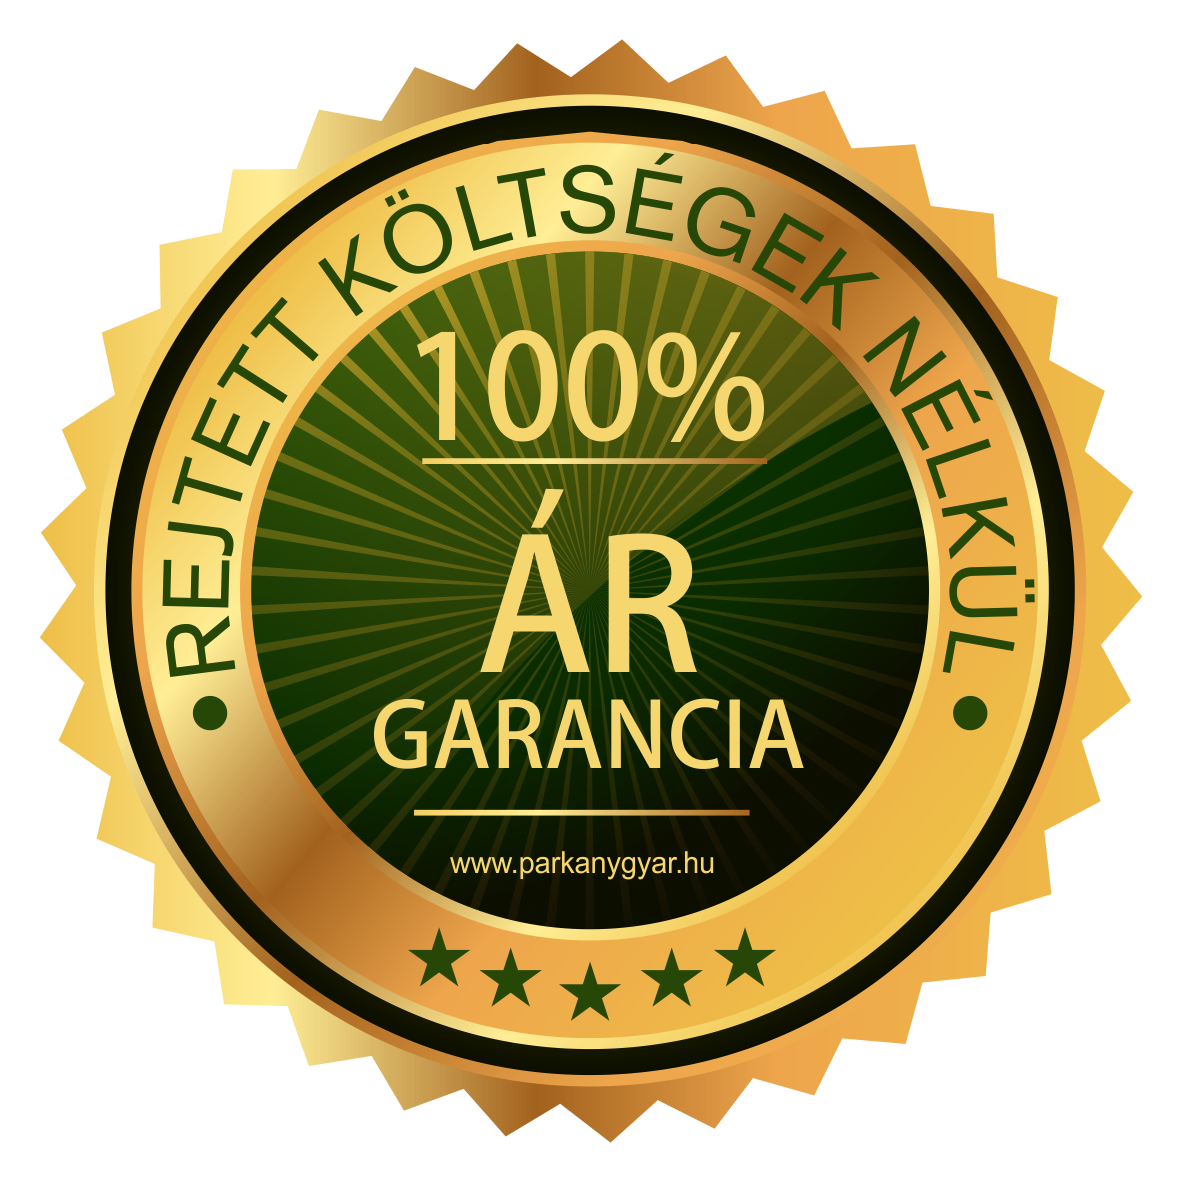 Ár Garancia